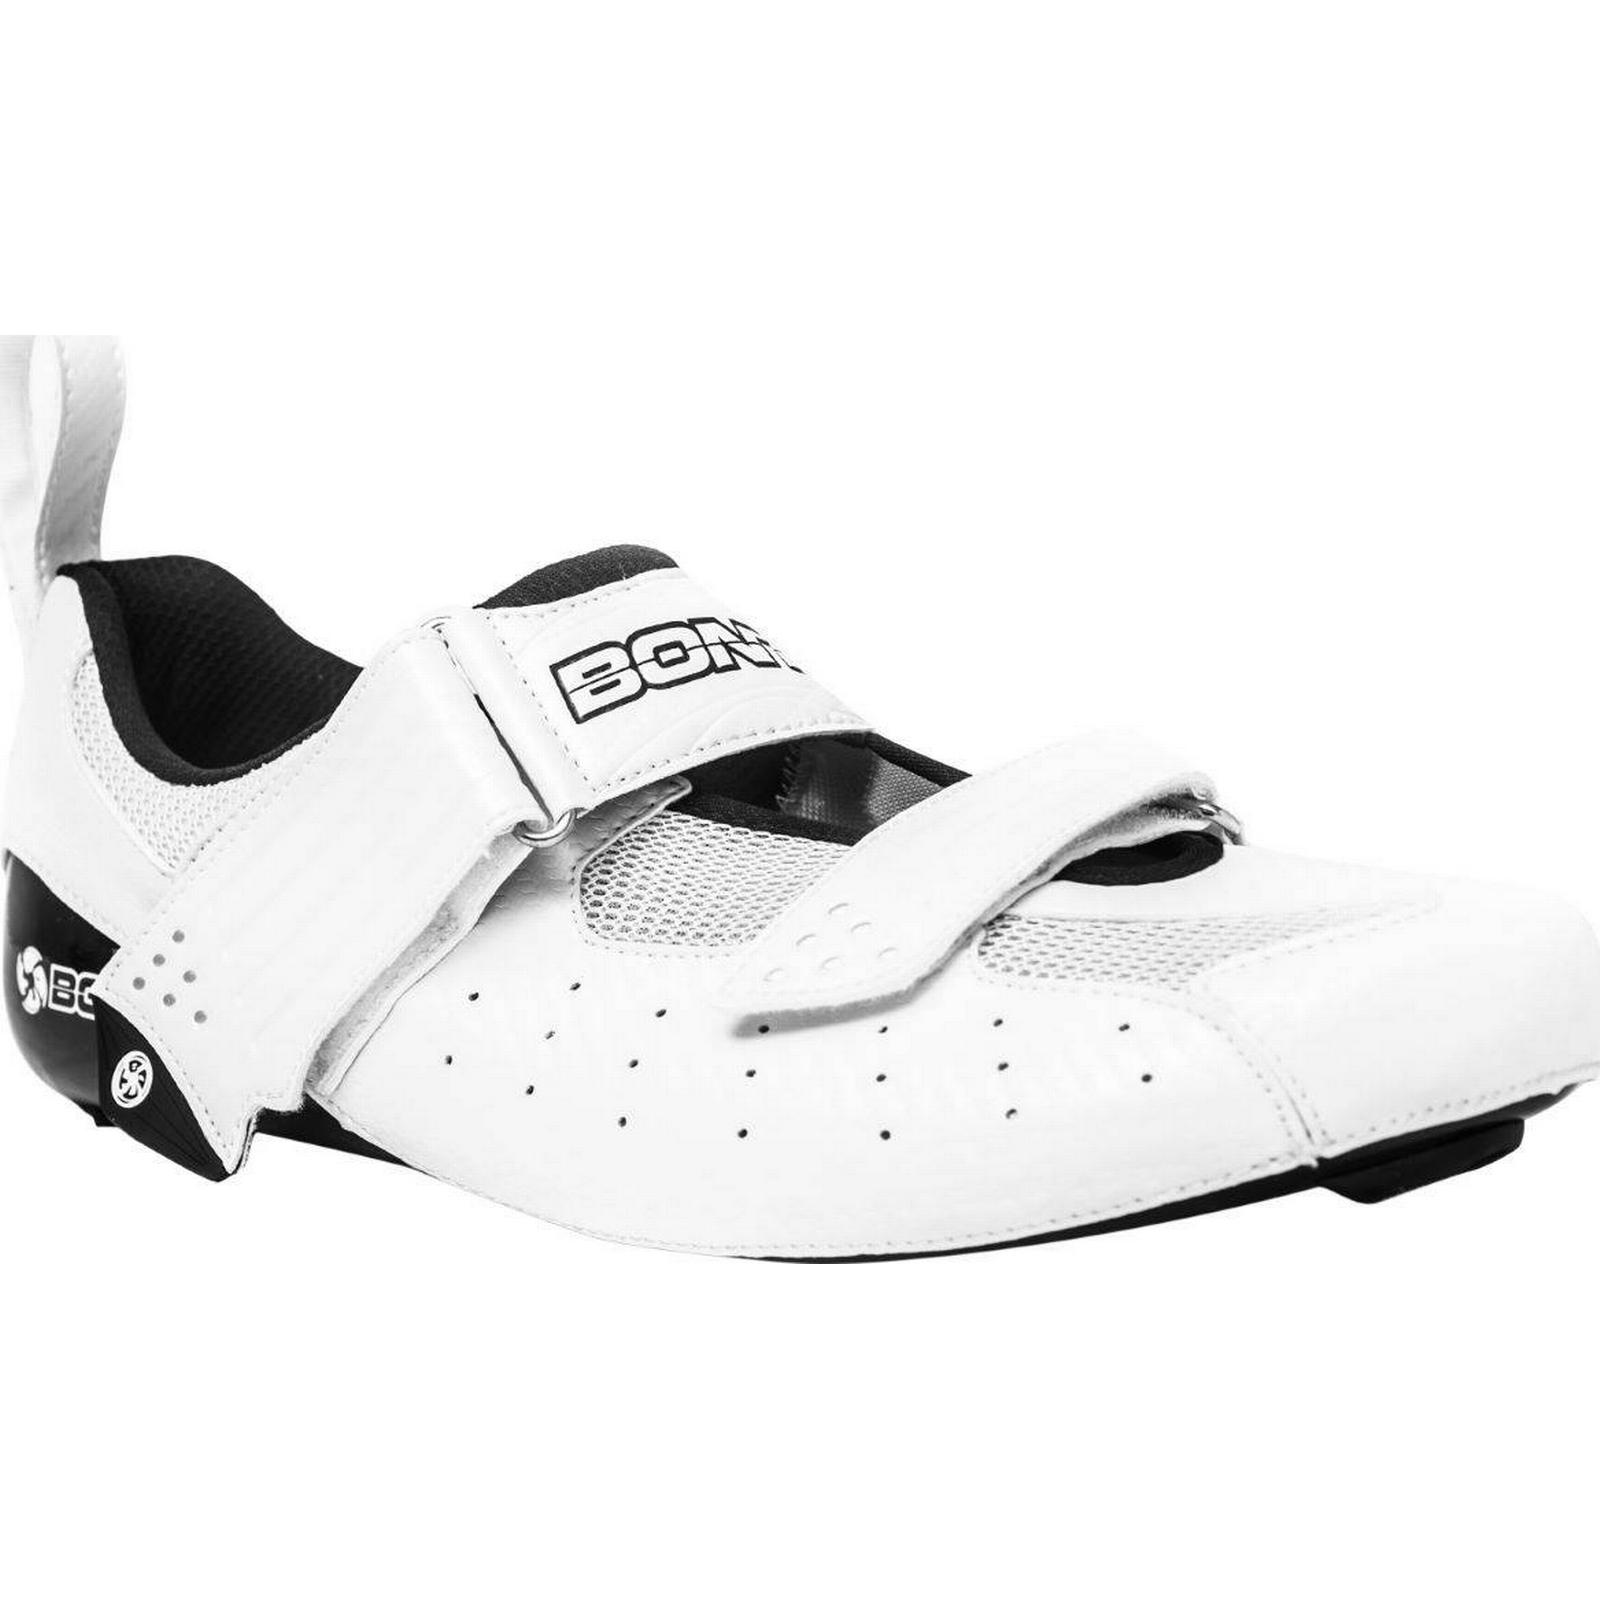 Wiggle Online Cycle Shop Bont Riot Tri Shoes Shoe (Asian Fit) Cycling Shoes Tri 63cbba